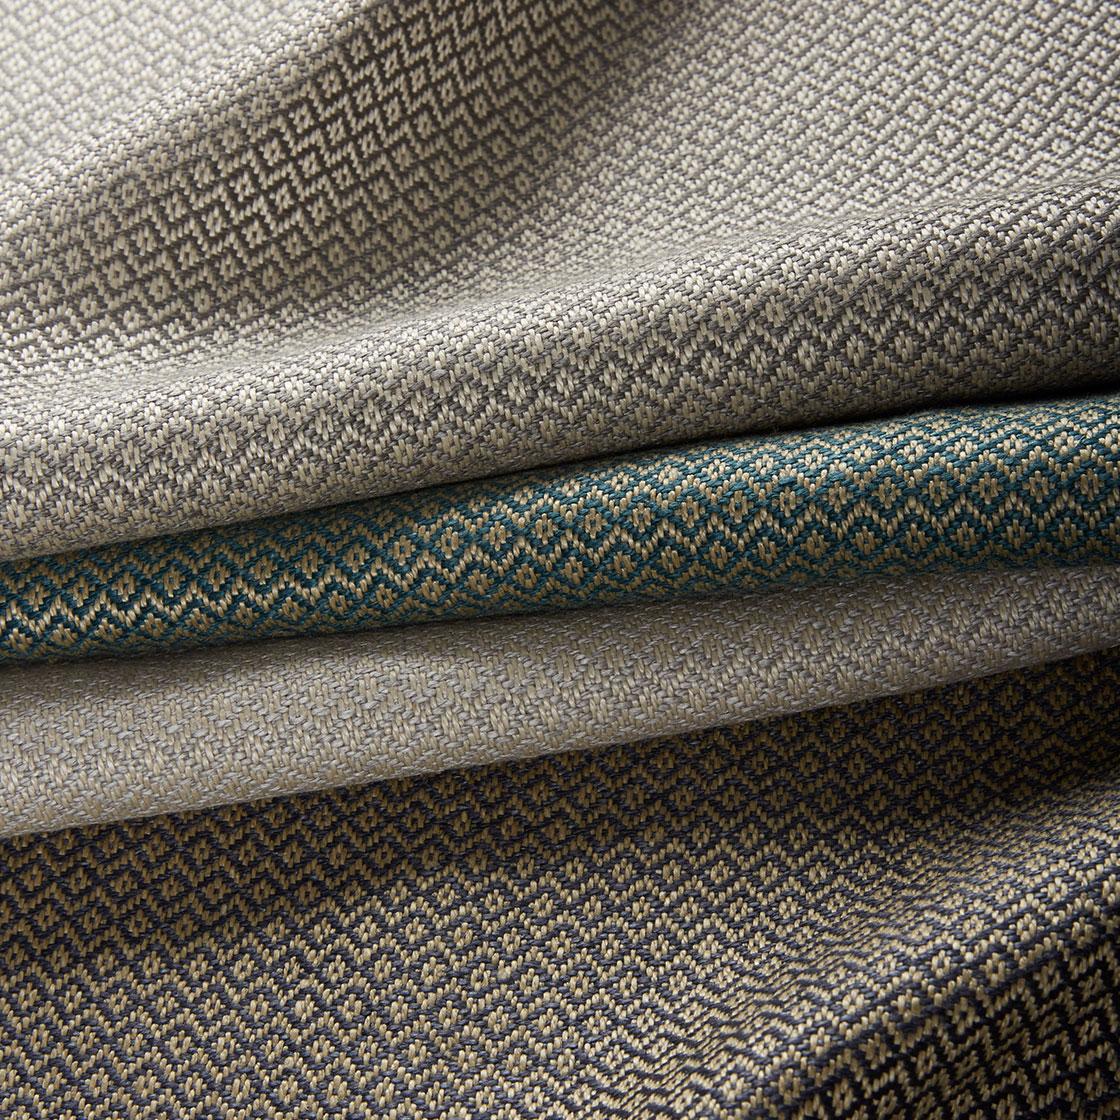 Piedmont Linen - Group - Beaumont & Fletcher - Beaumont & Fletcher